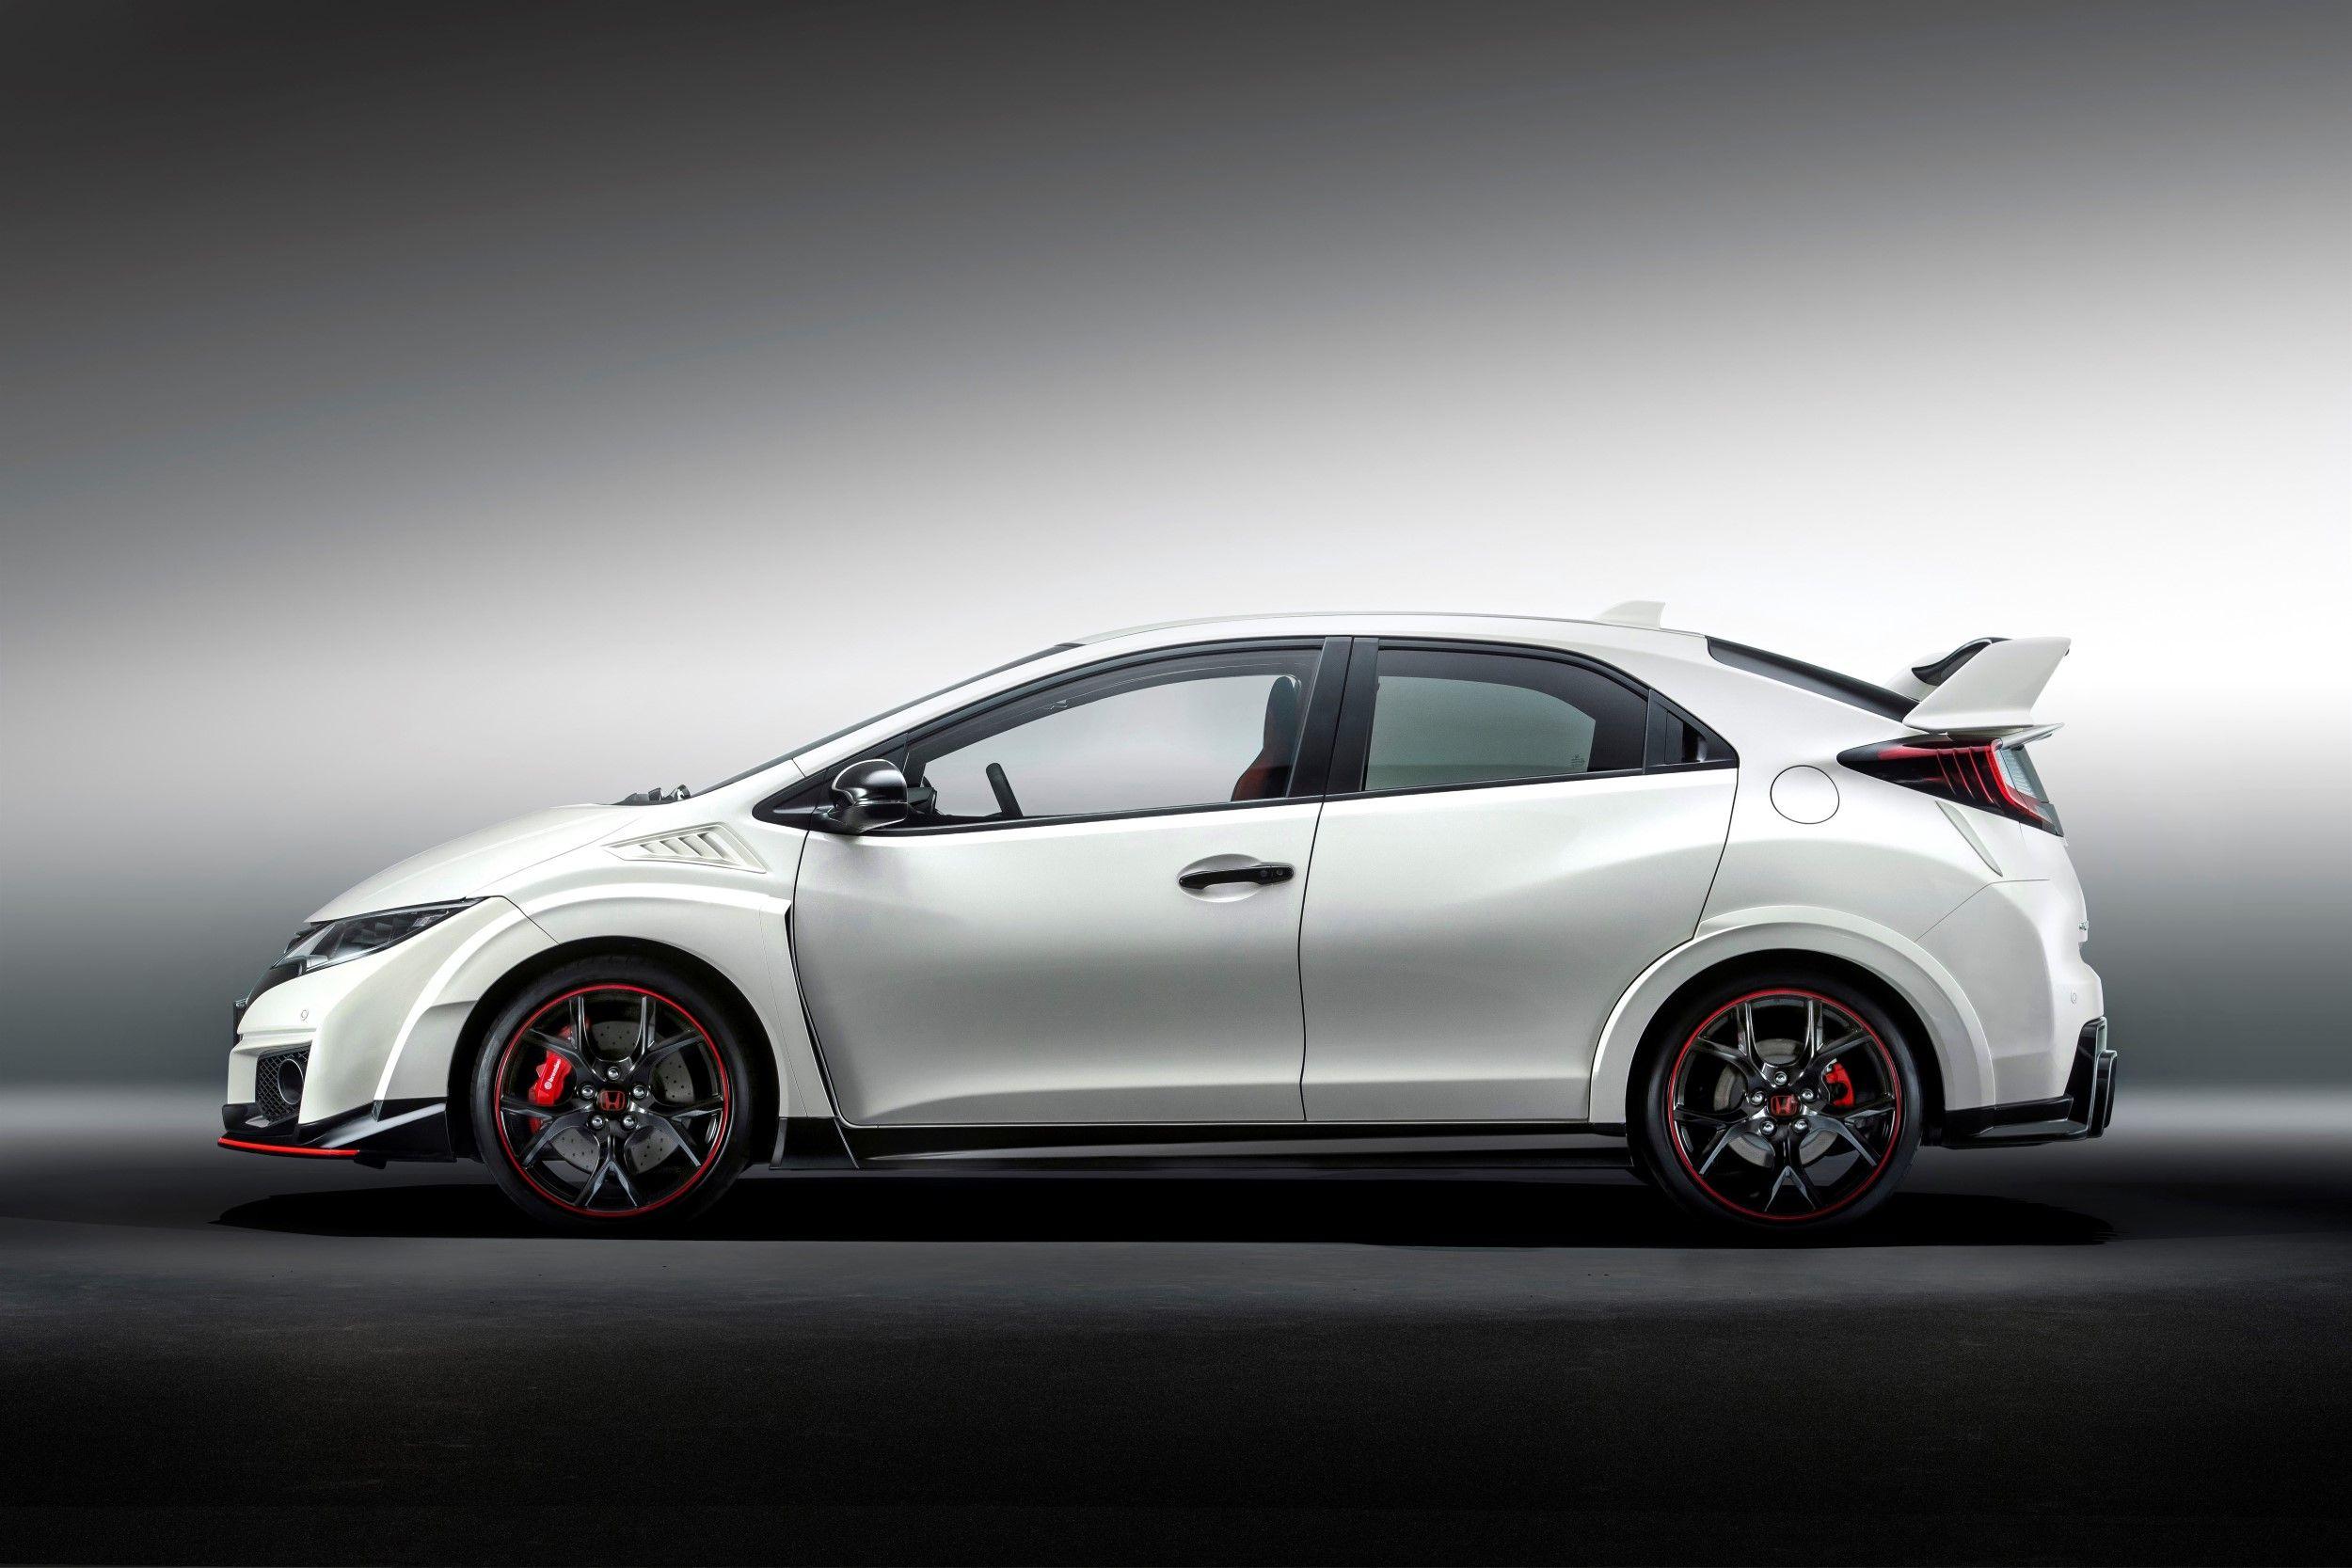 2016 Honda Civic Type R Honda civic type r, Honda civic